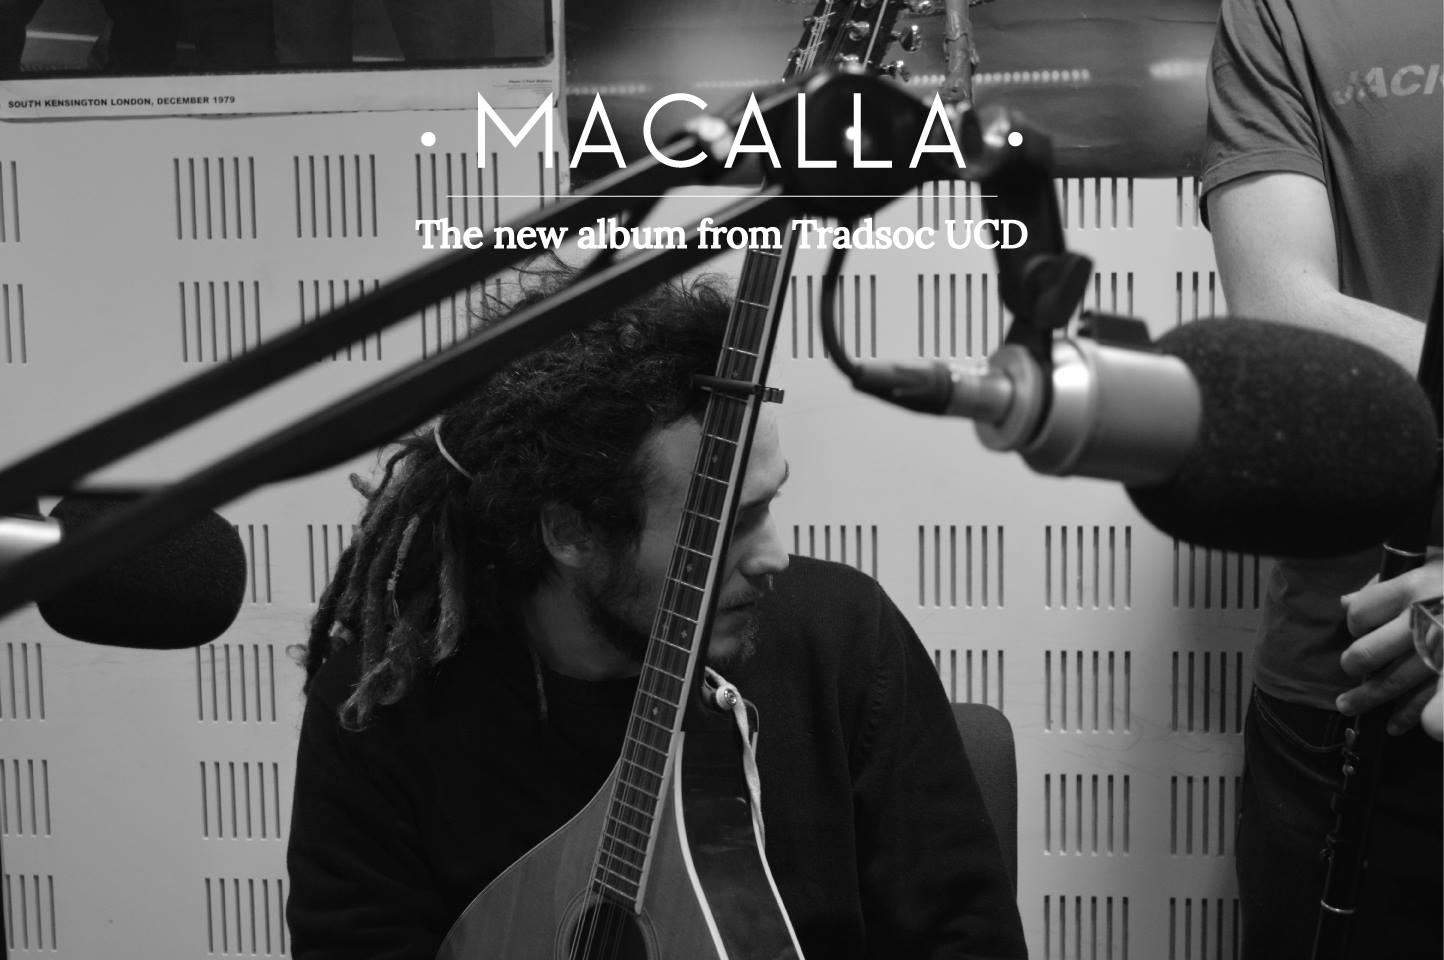 Macalla album cover